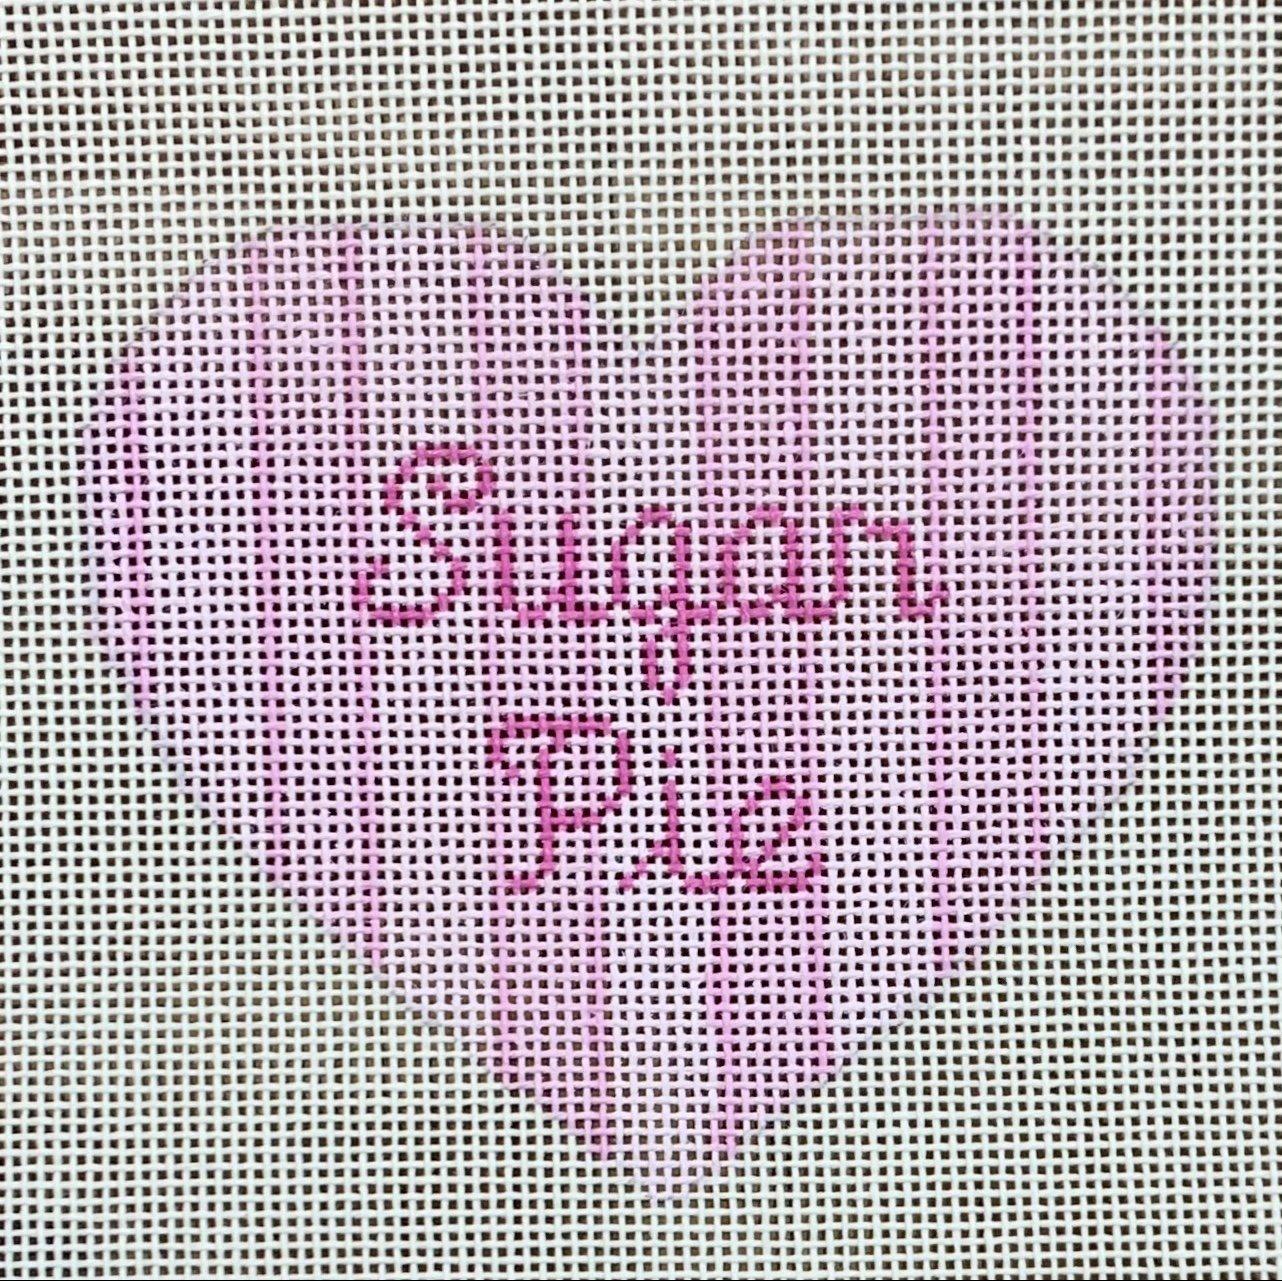 Heart Ornament - Sugar Pie